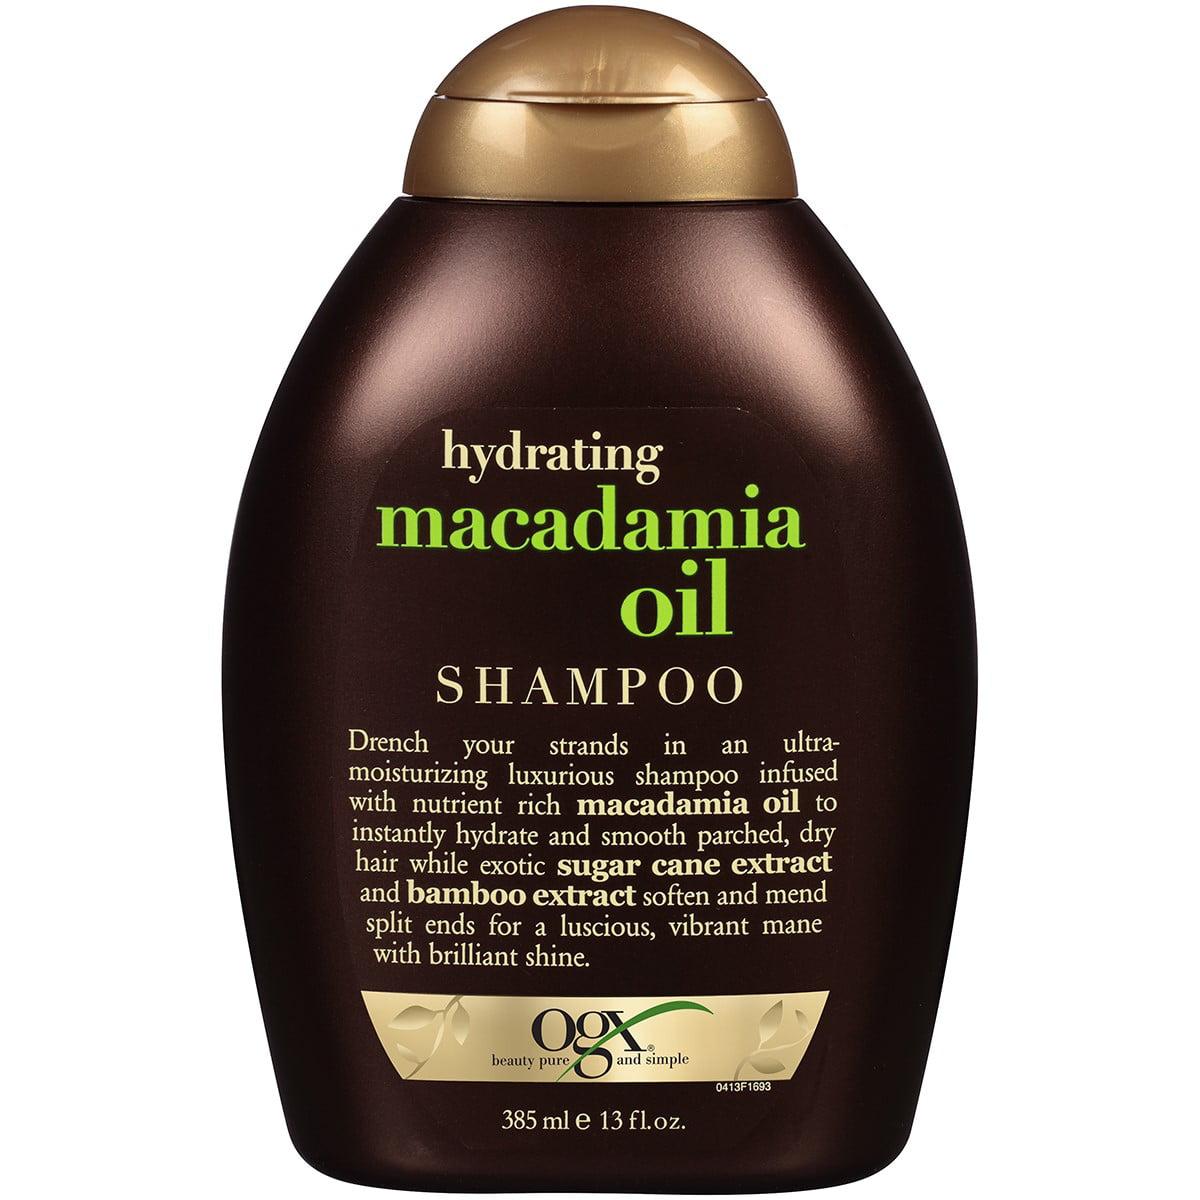 OGX Hydrating Macadamia Oil Shampoo, 13 Oz